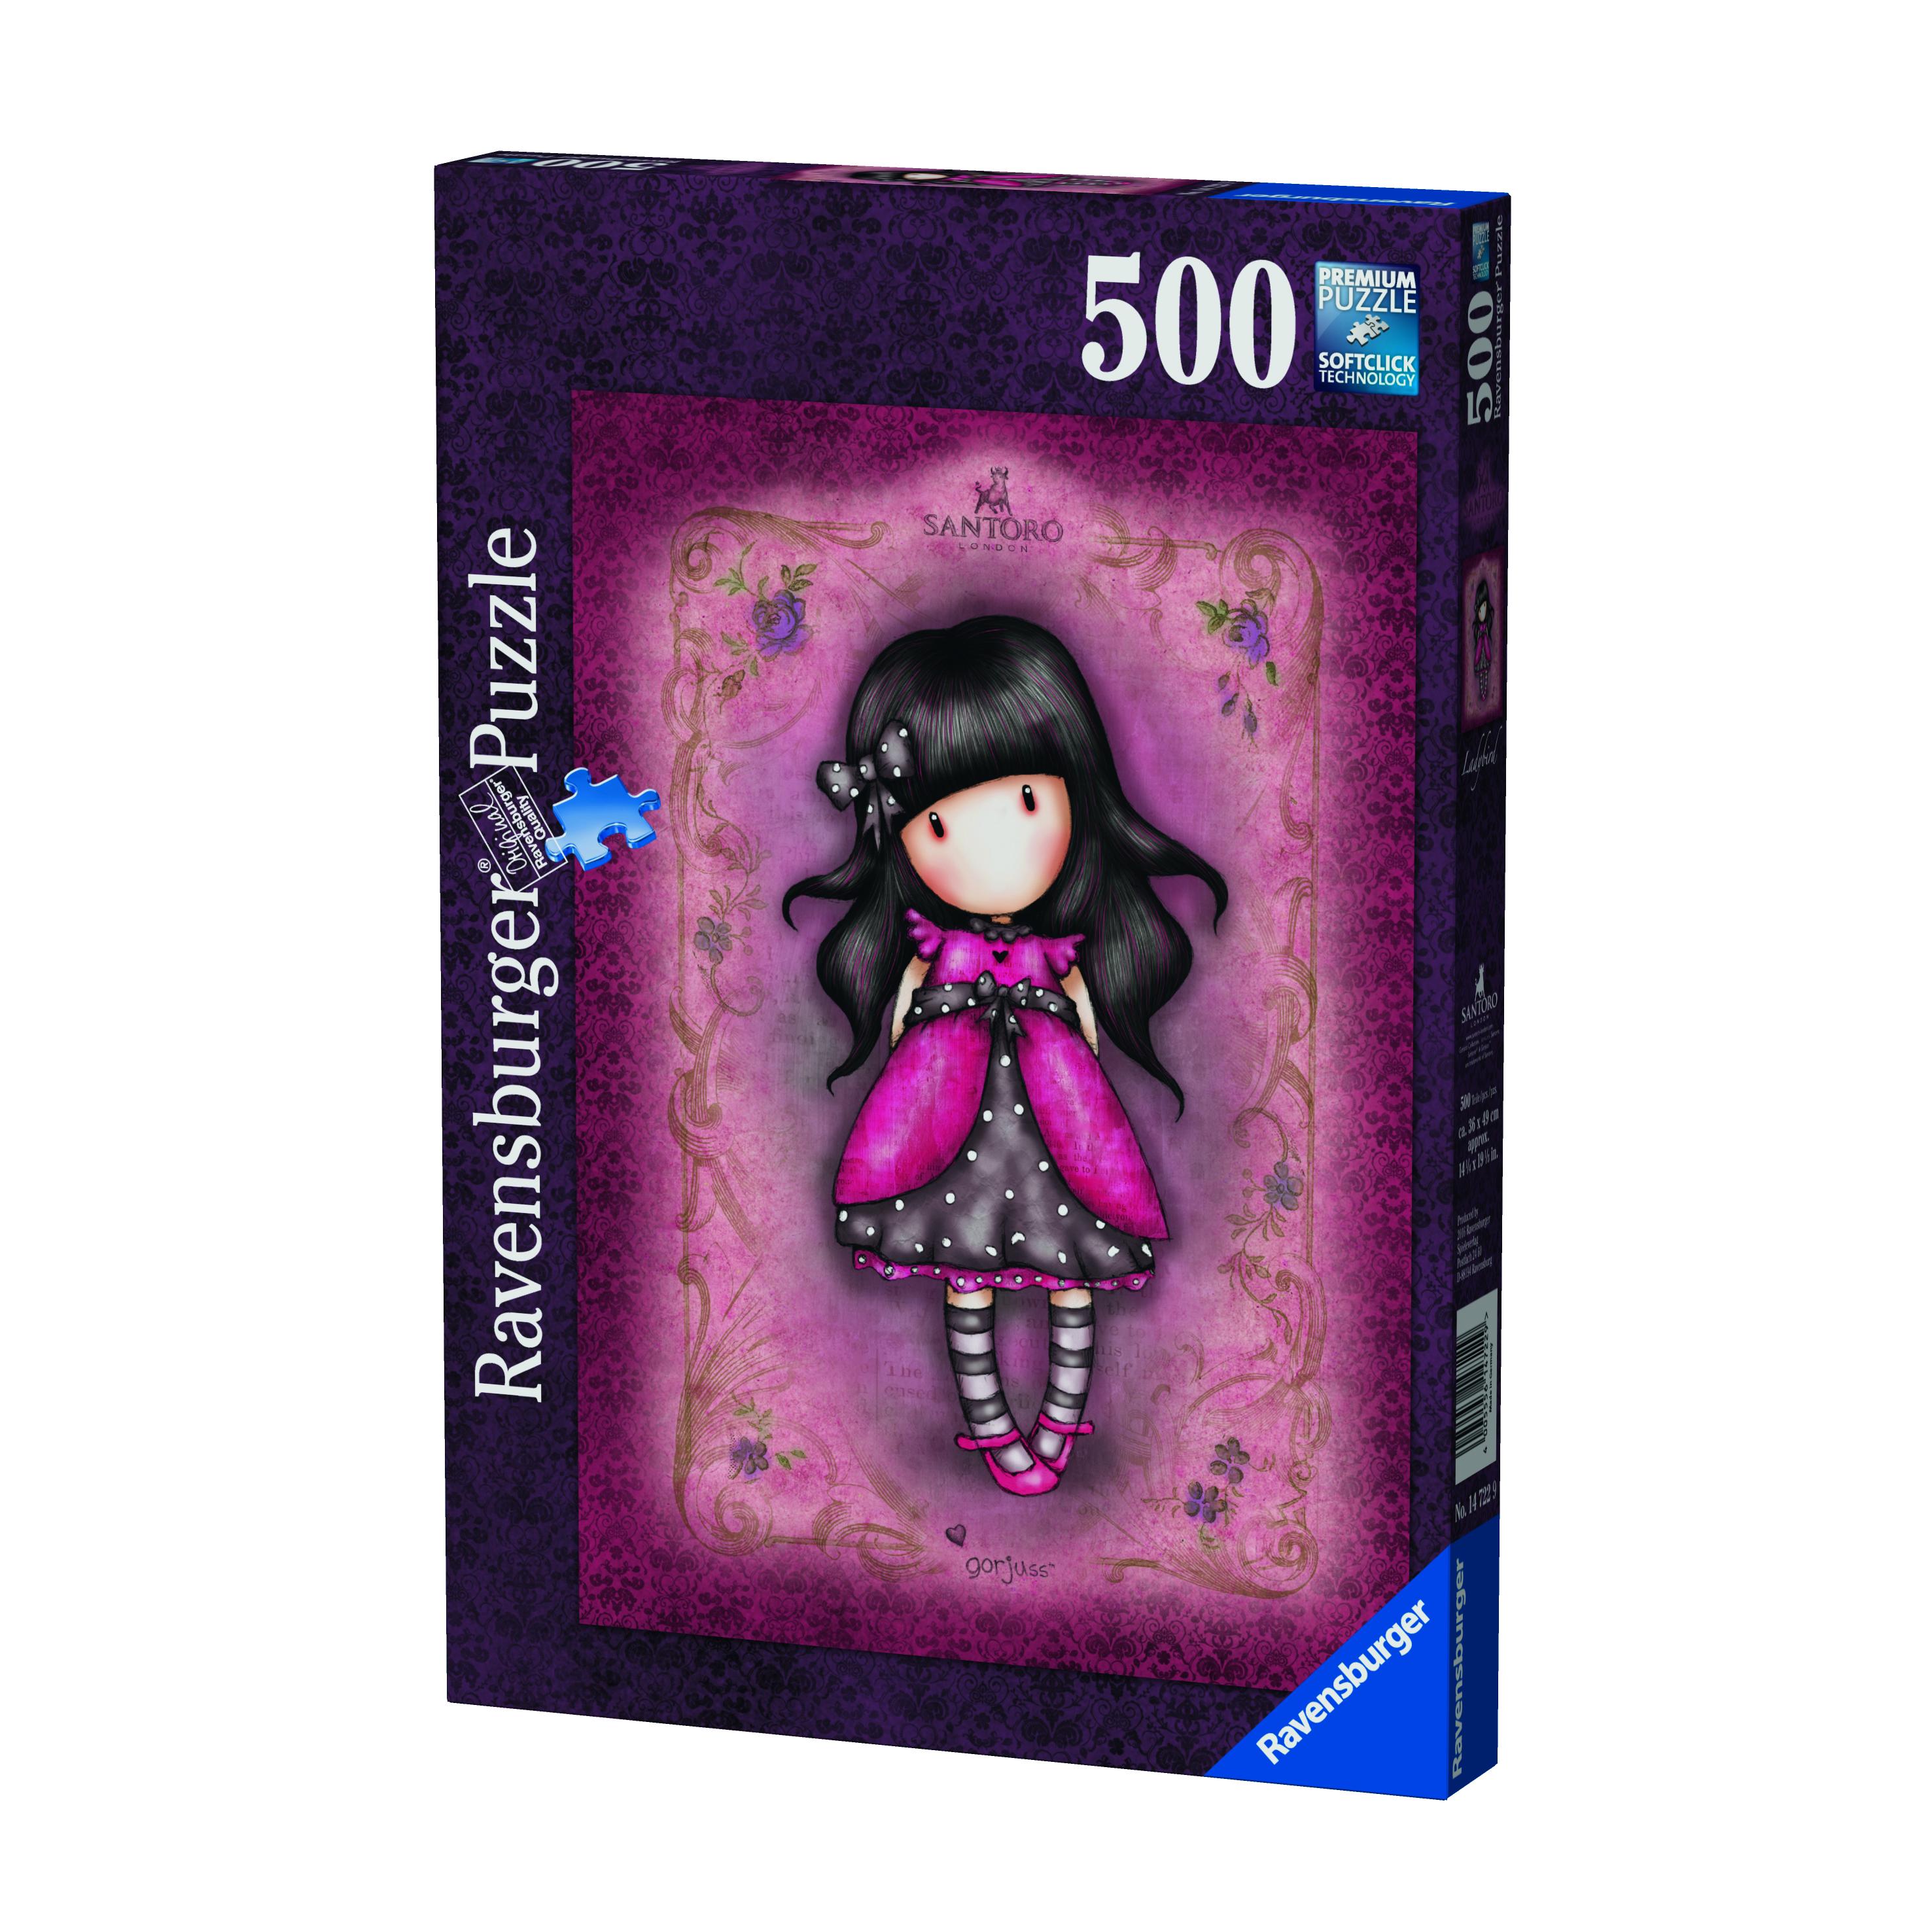 Puzzle 500 pièces - Gorjuss - Ladybird - Ravensburger